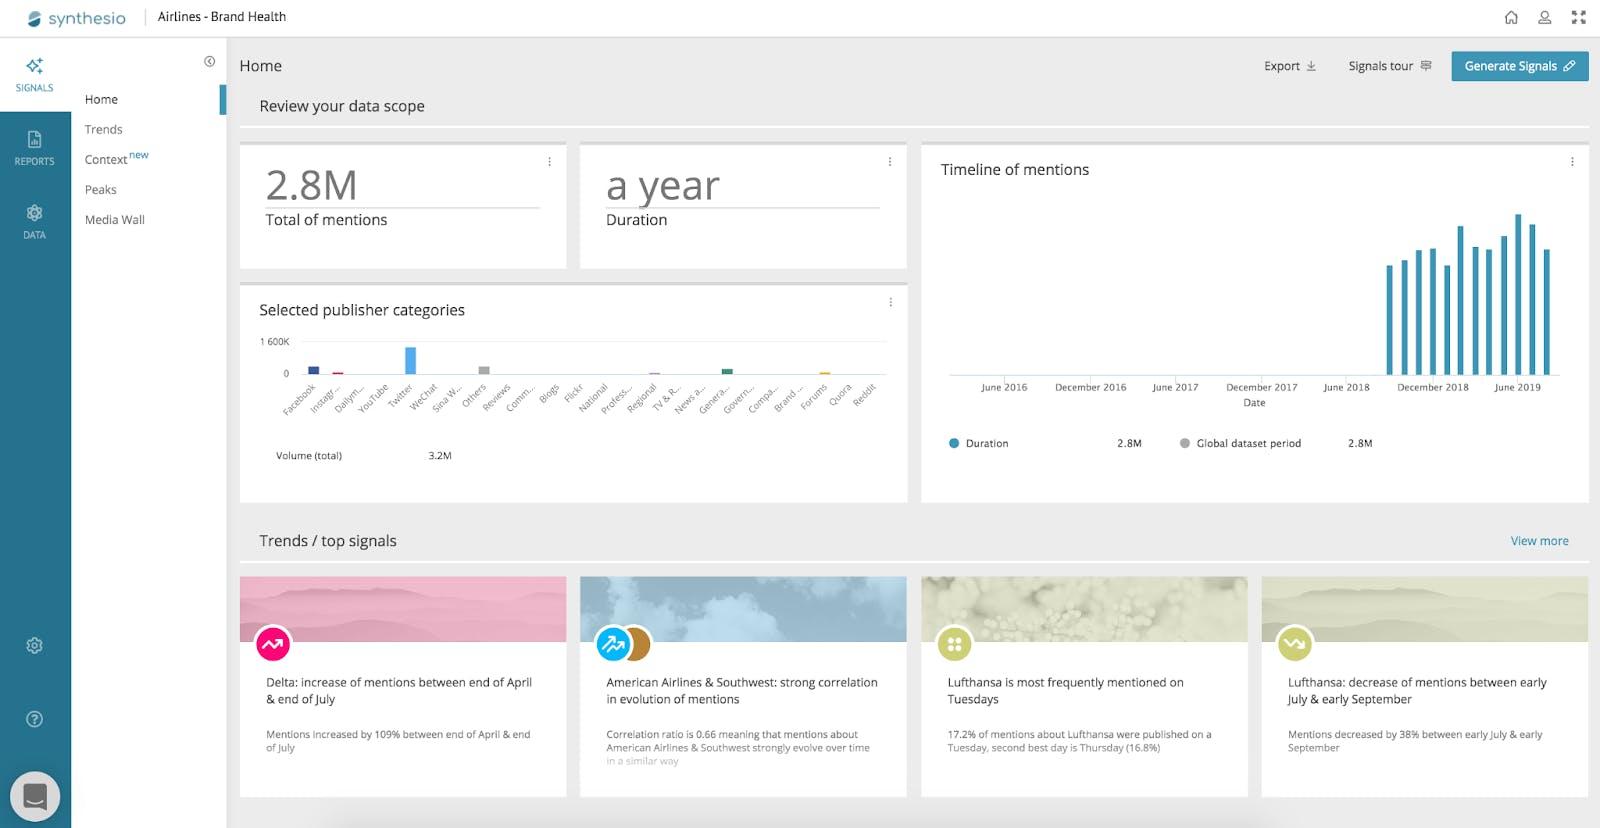 synthesio social analytics dashboard for social media monitoring tool